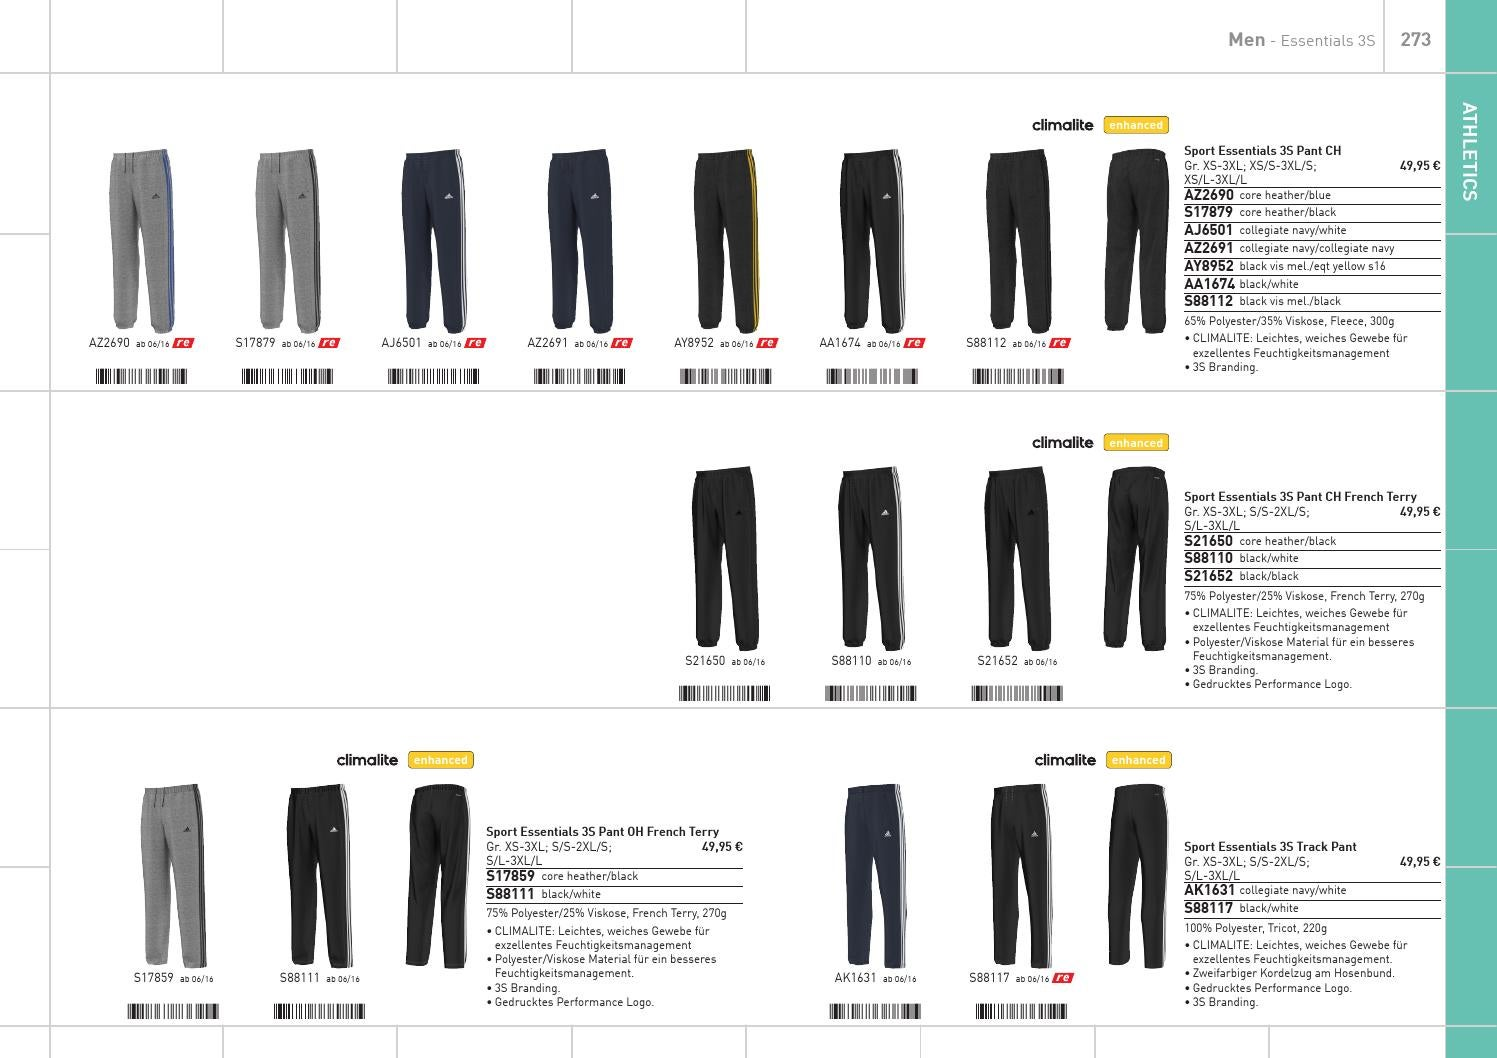 Adidas textil 2016 q3 by Euroteamsport Vilshofen issuu